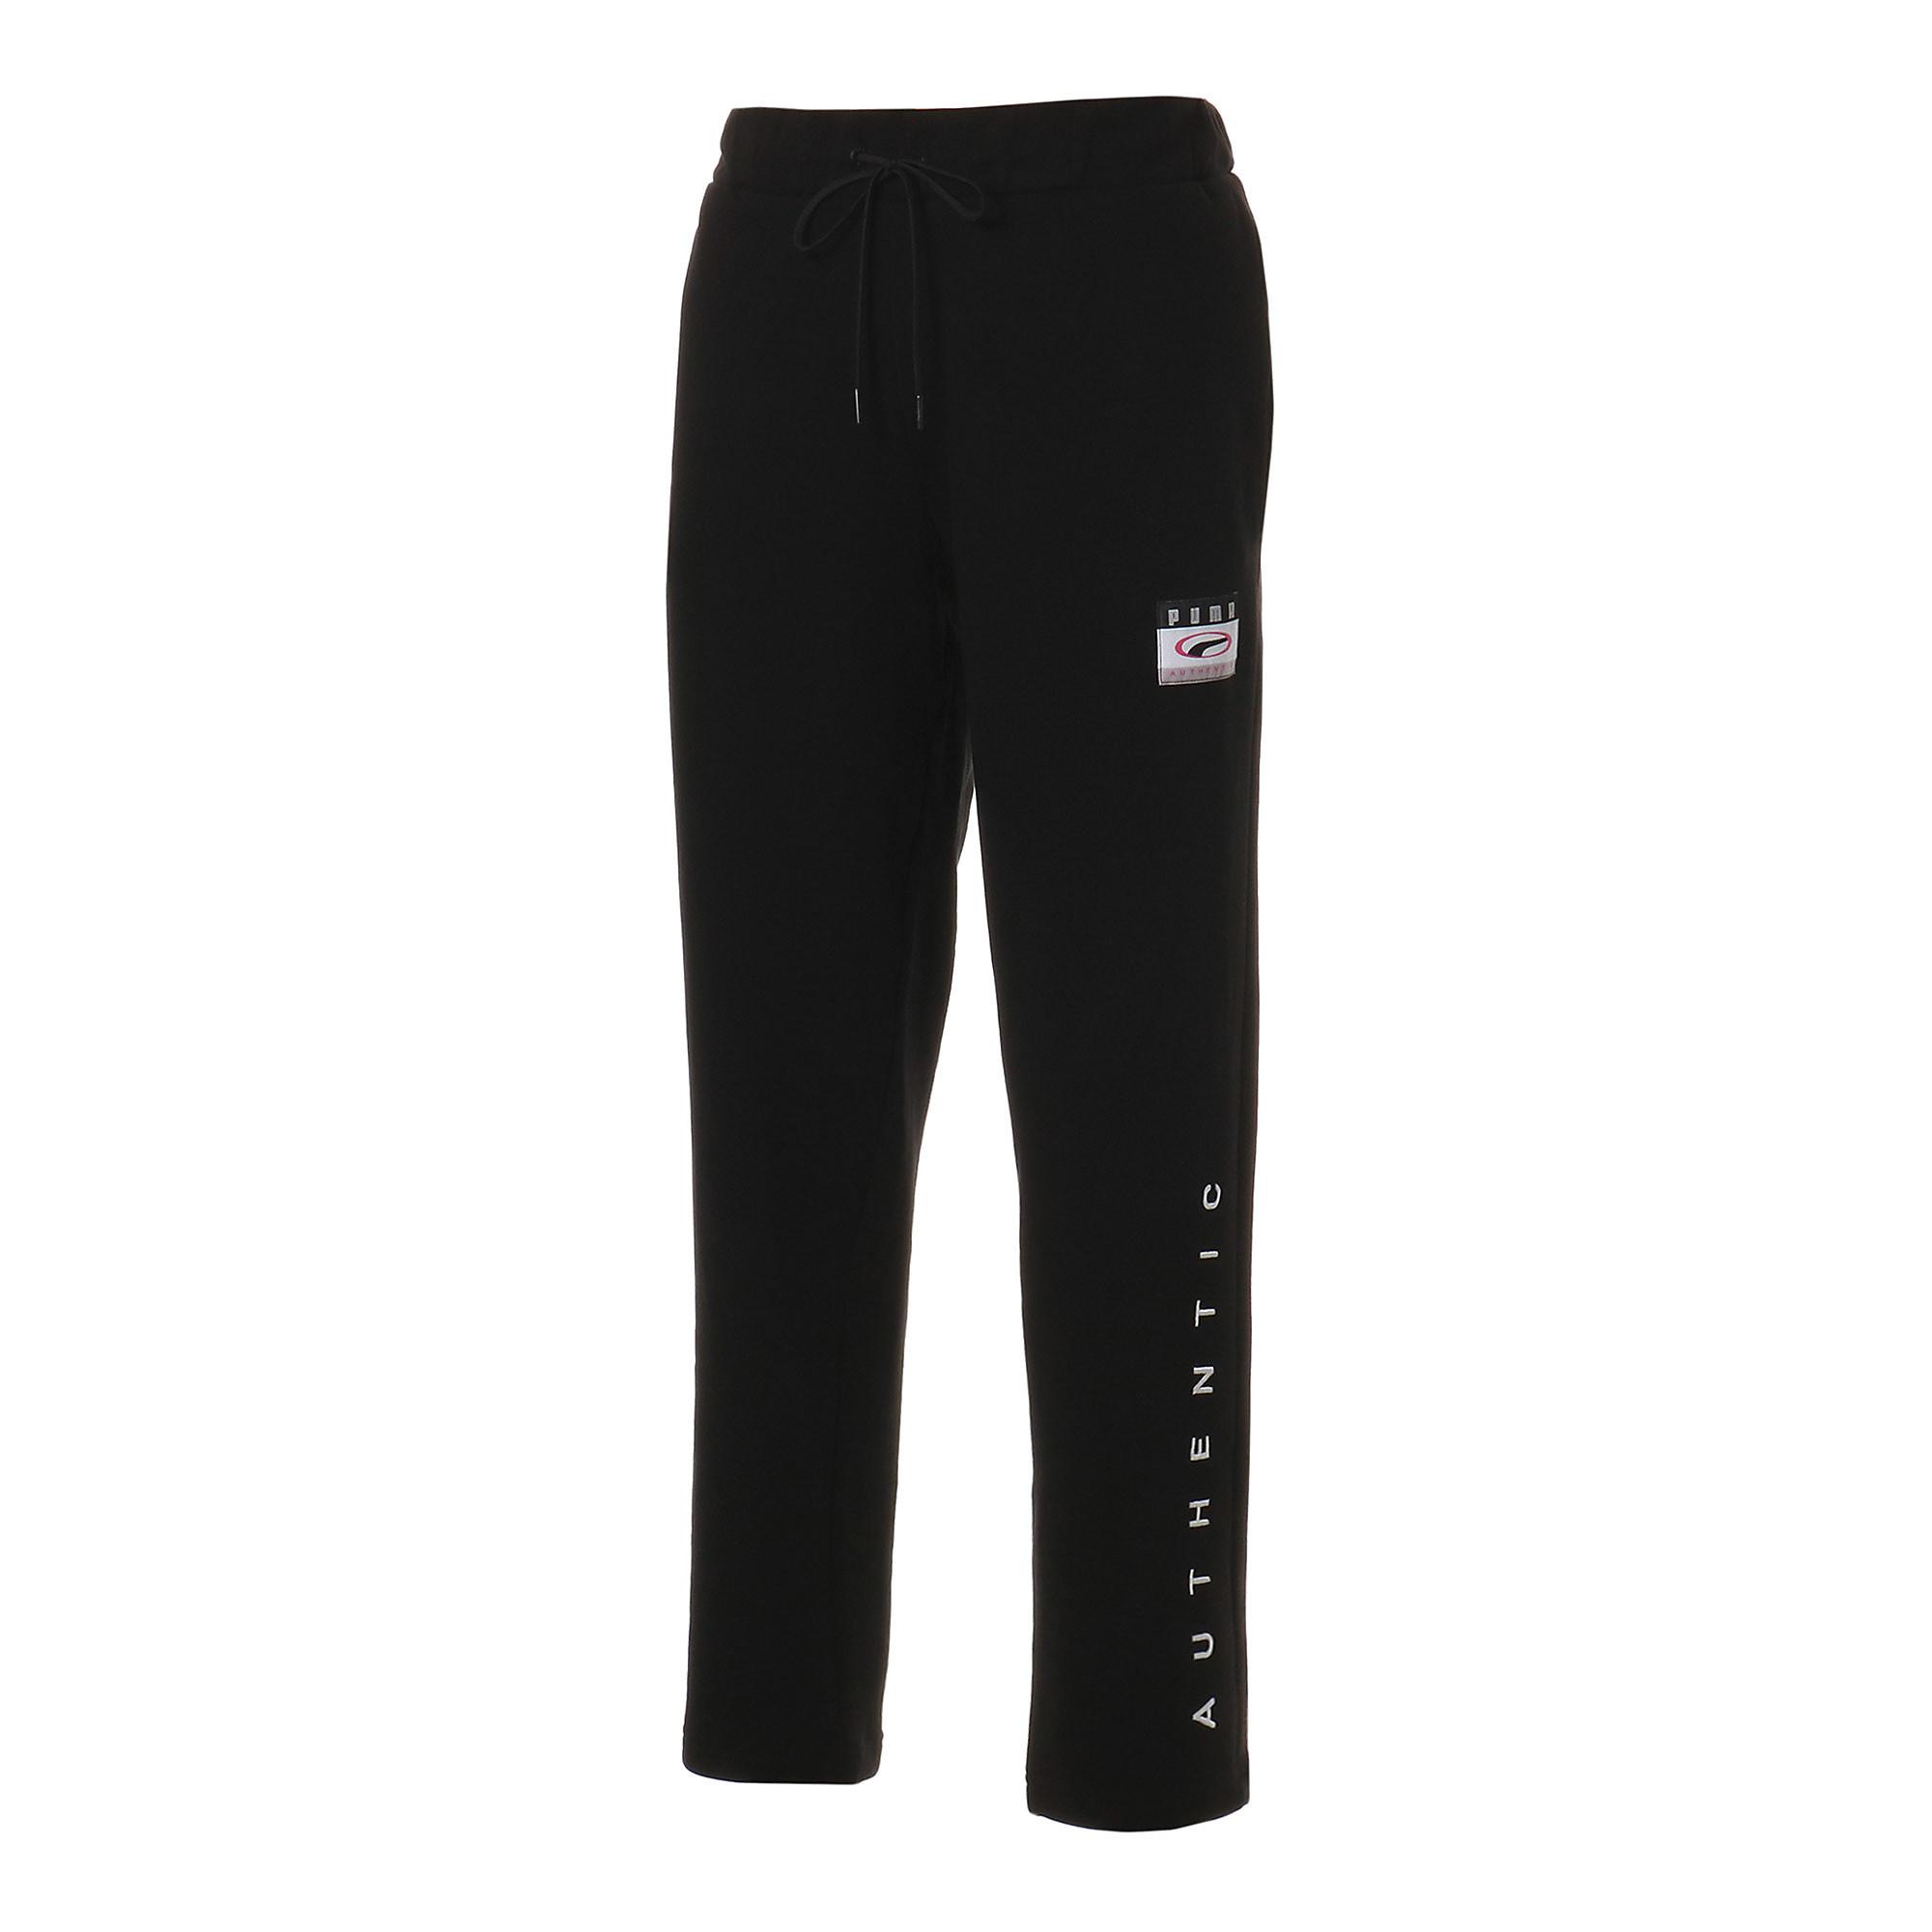 Брюки PUMA 90s Retro Sweat Pants брюки мужские puma ess sweat pants tr op цвет серый 838373031 размер xxl 52 54